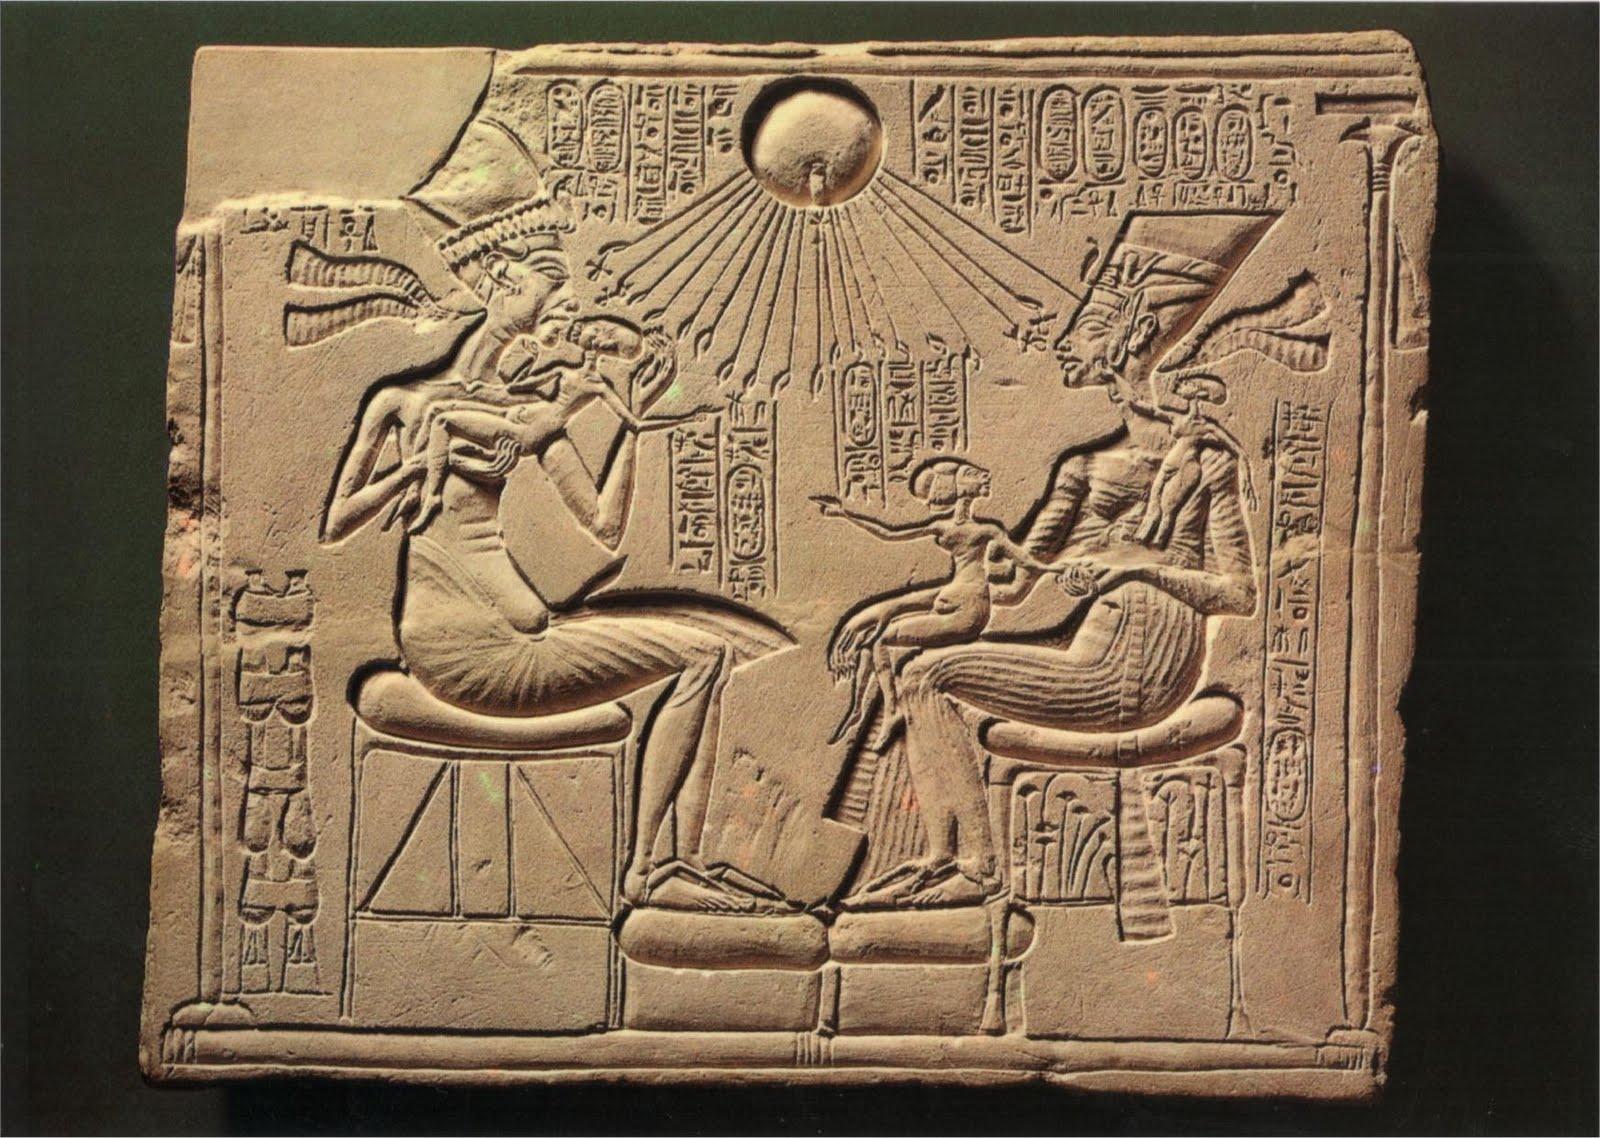 4. Relieve Amenofis IV y Nefertiti